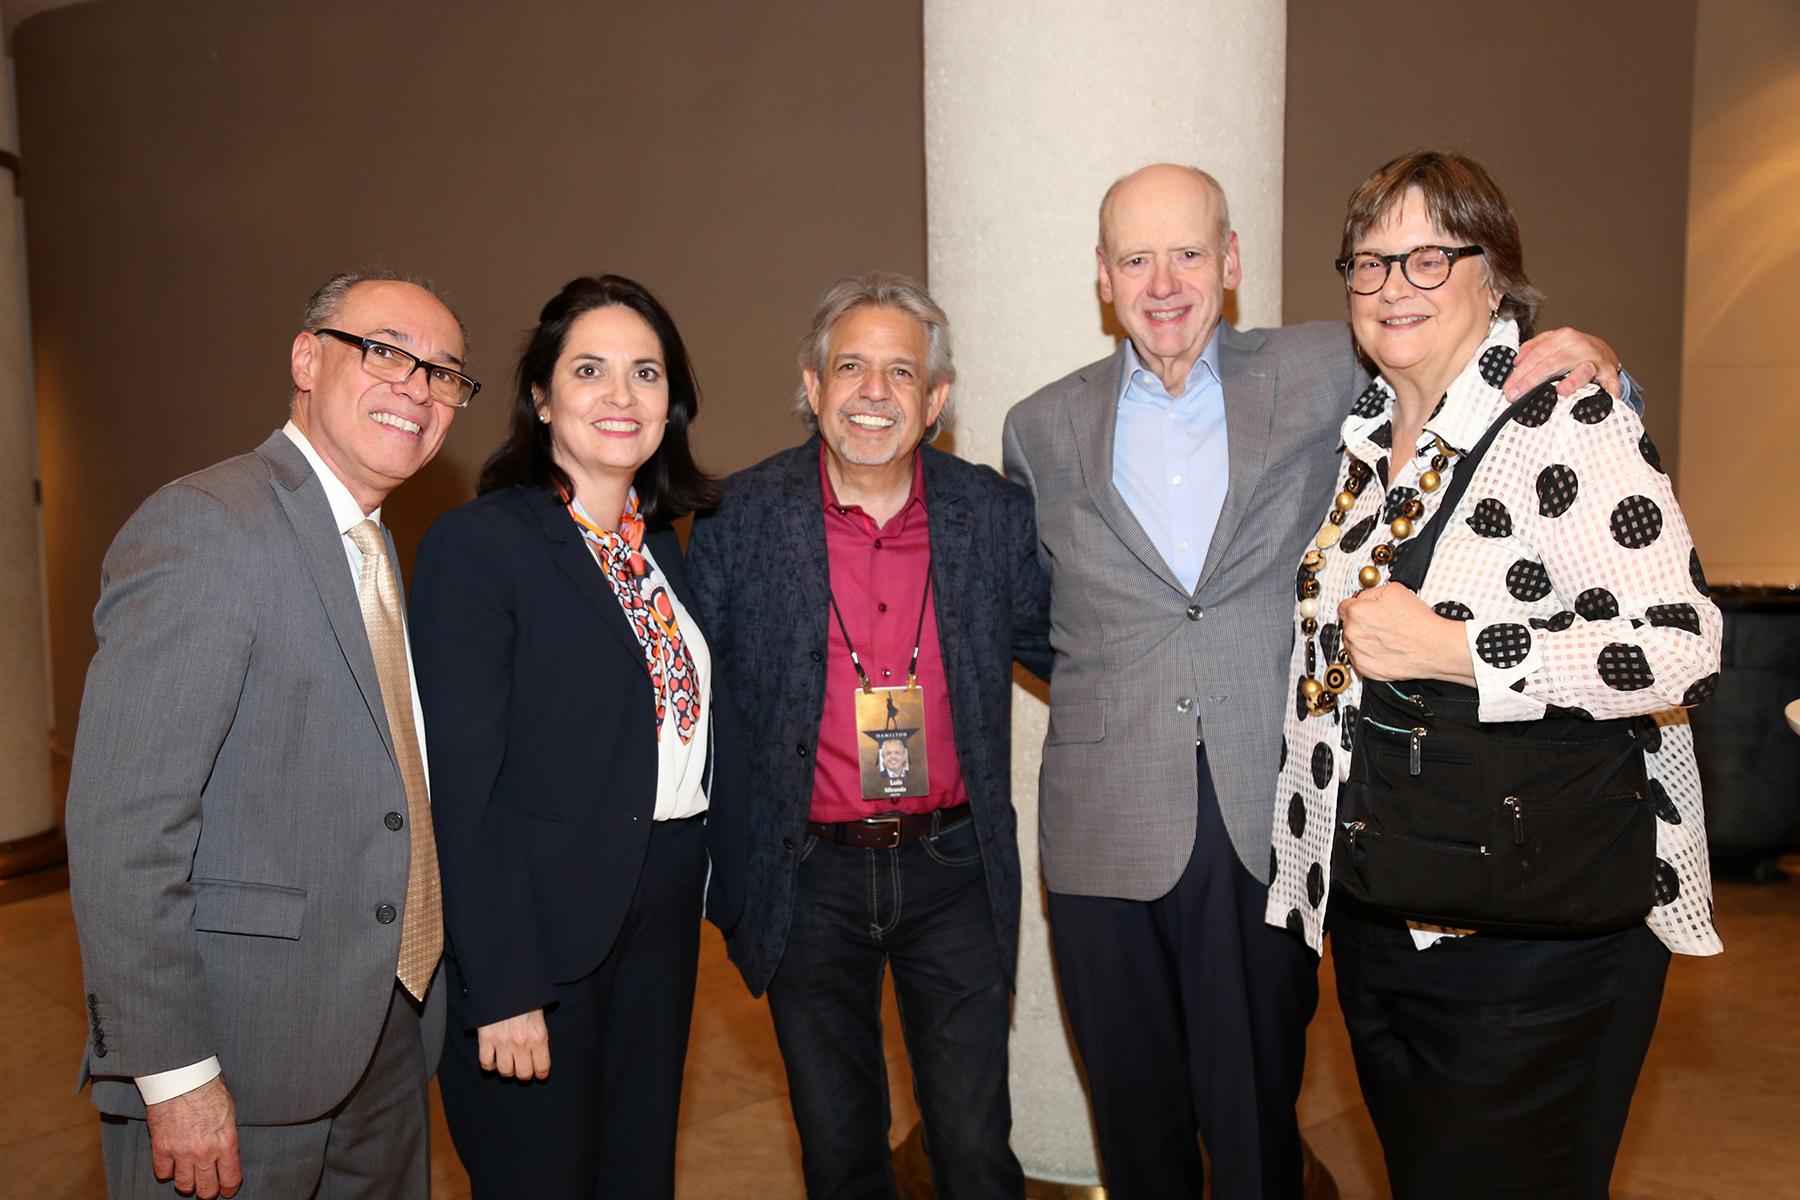 Billy Ocasio, Marta Mabel Pérez, Luis Miranda, Jerry y Susan Johnson. Foto Nichole Saldarriaga